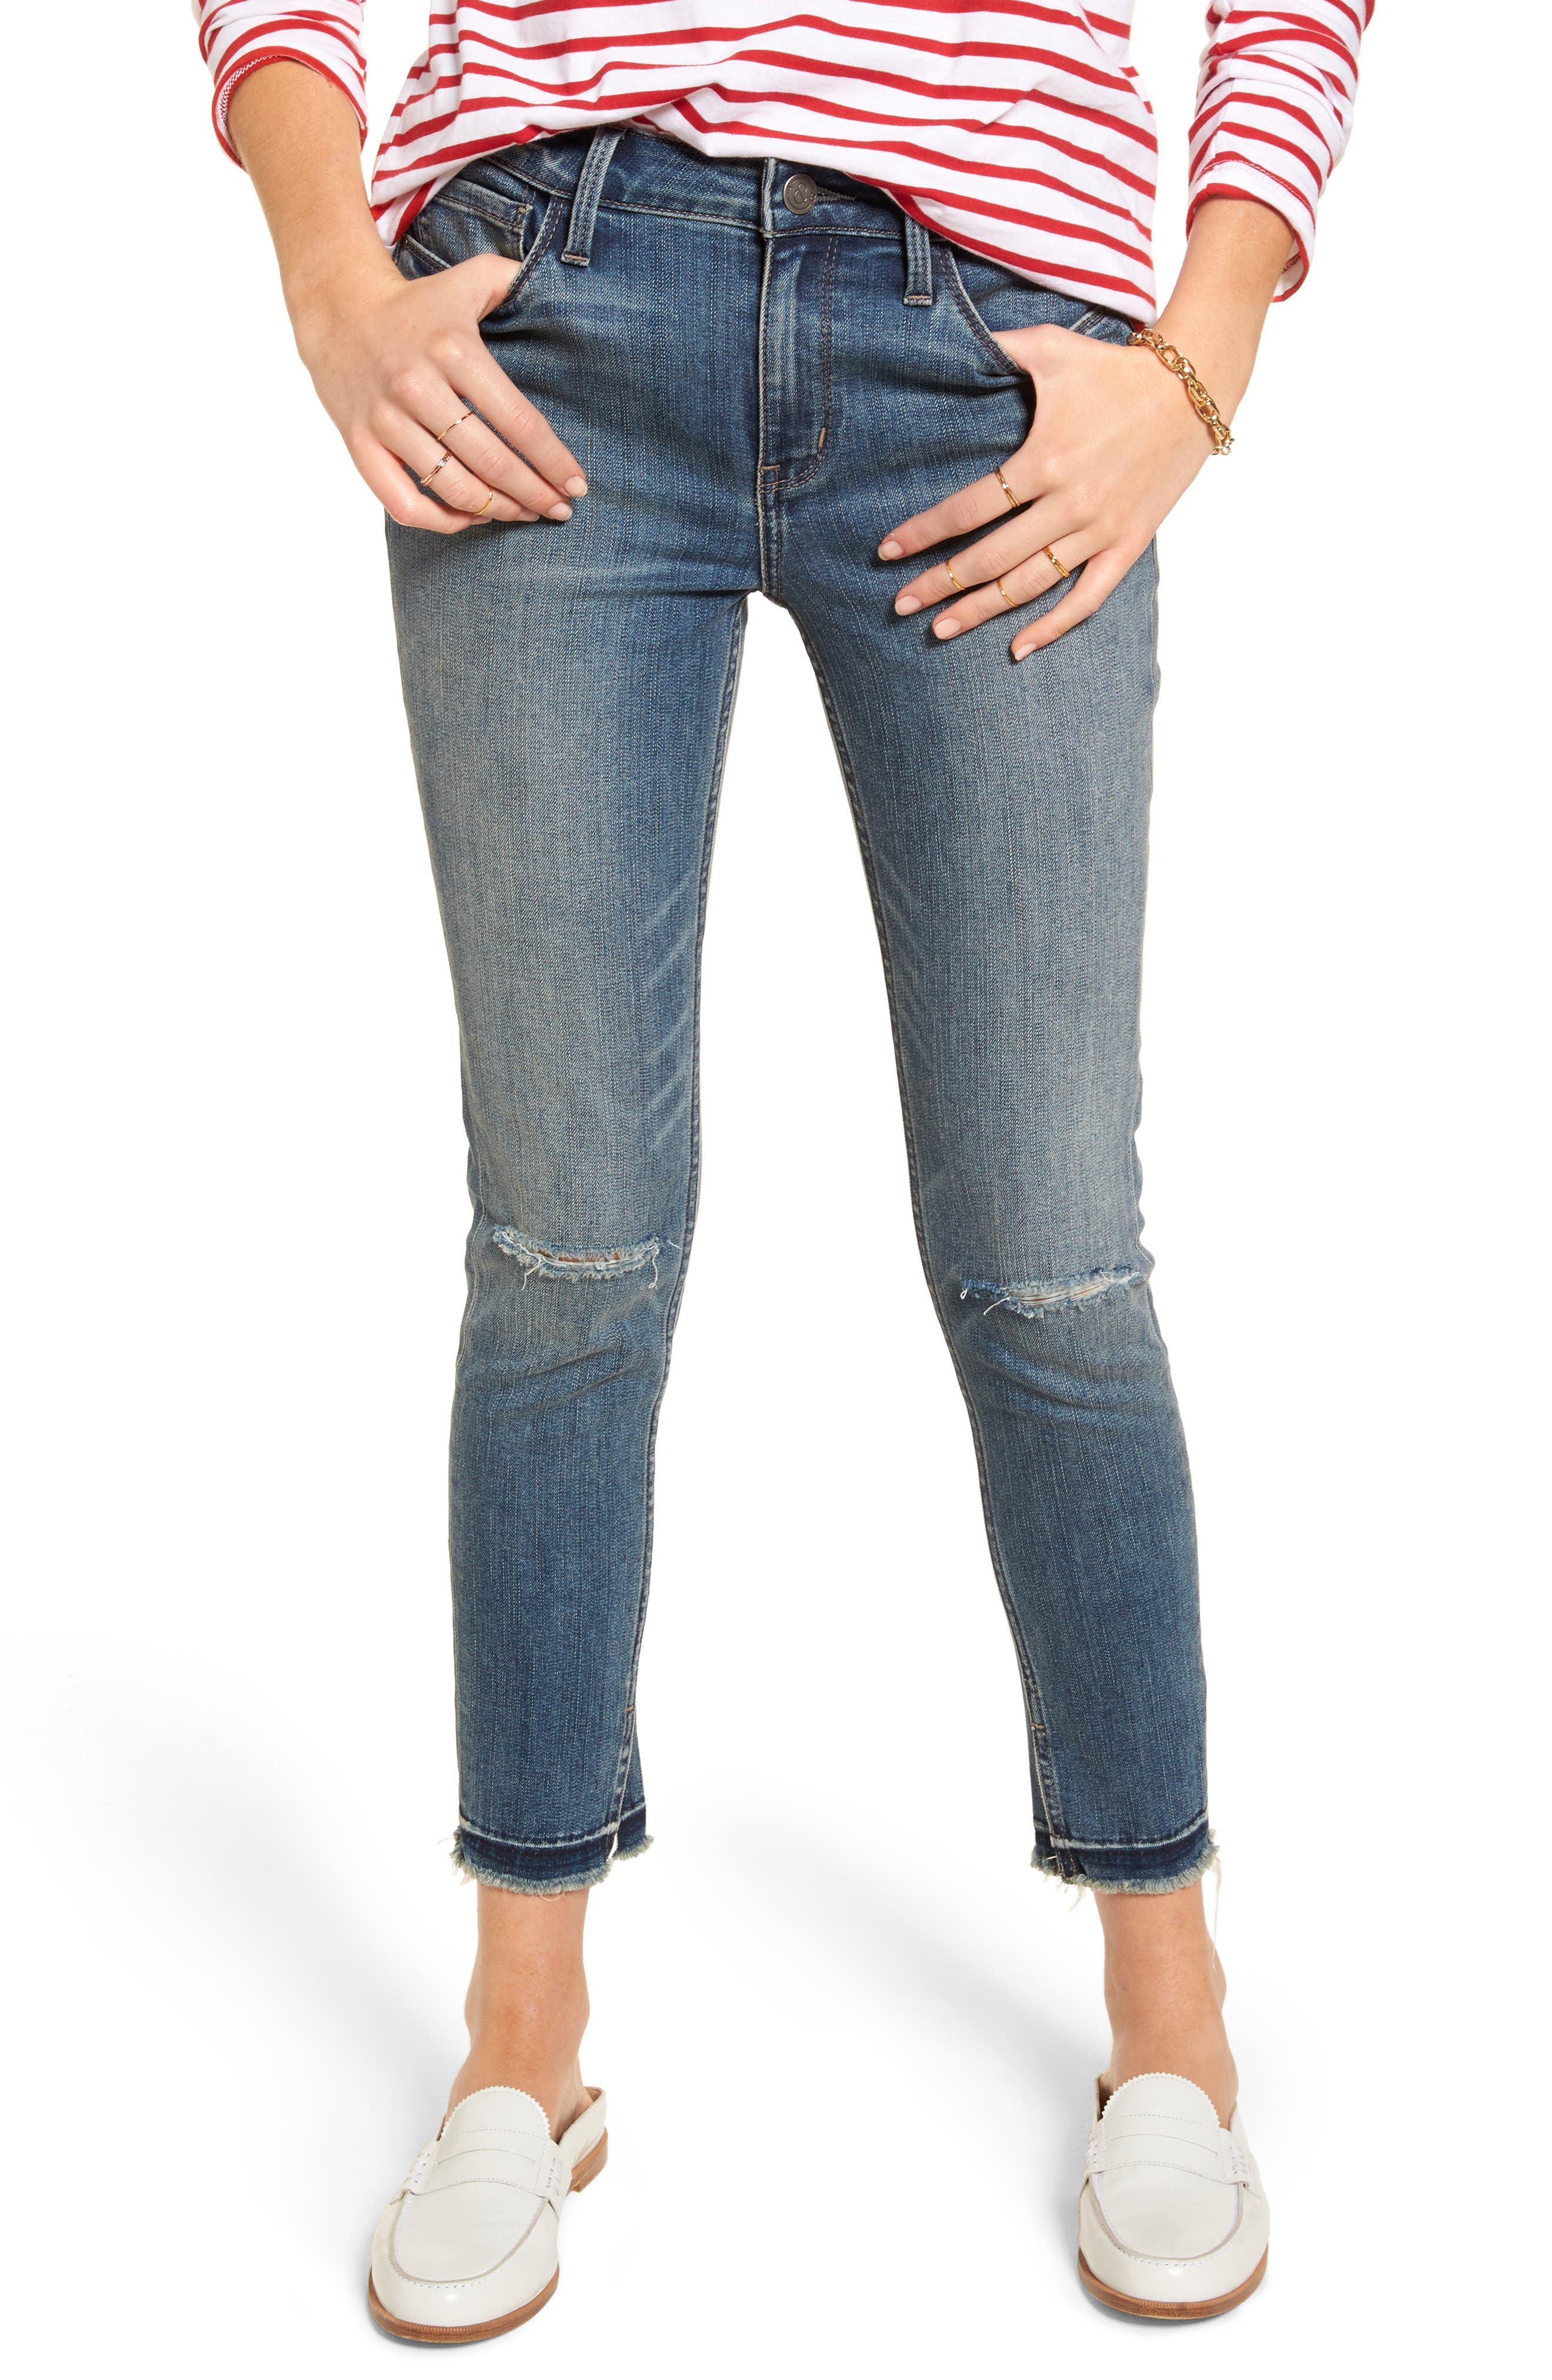 Alternate Image 1 Selected - Treasure & Bond Ankle Skinny Jeans (Rain Dusk Destroy)